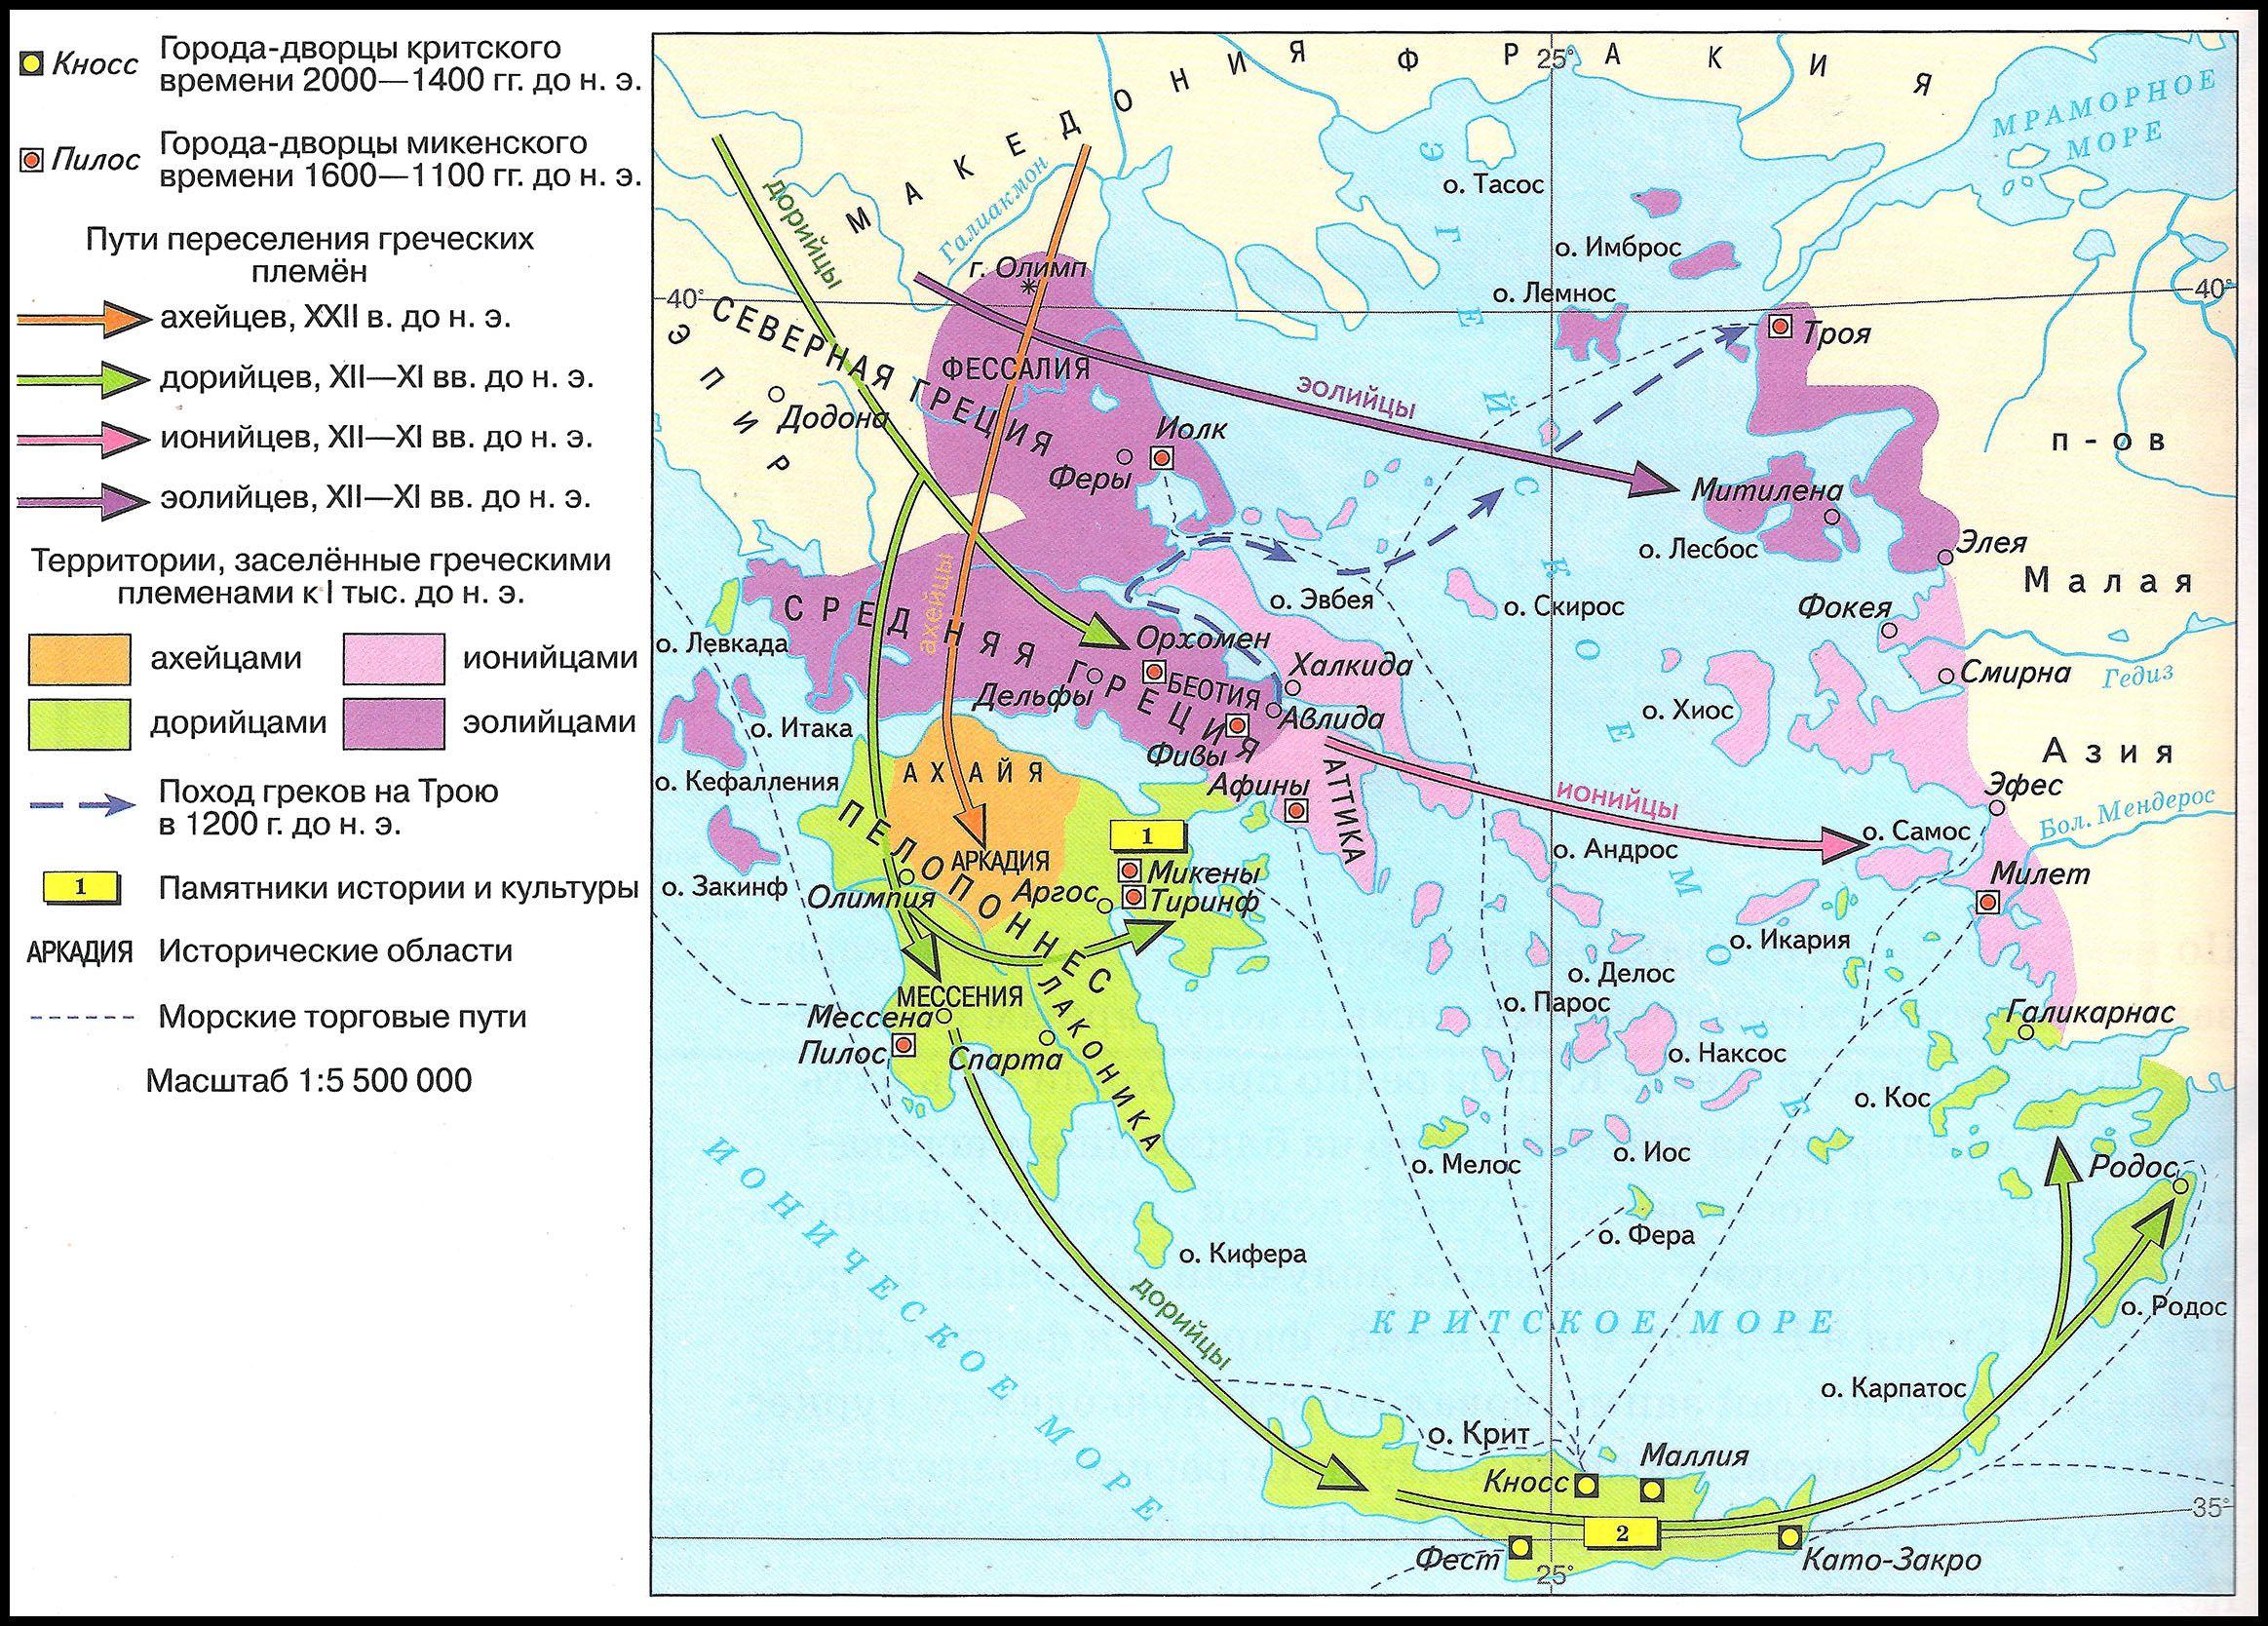 Эгейский мир, 2000-1100 гг. до н.э.